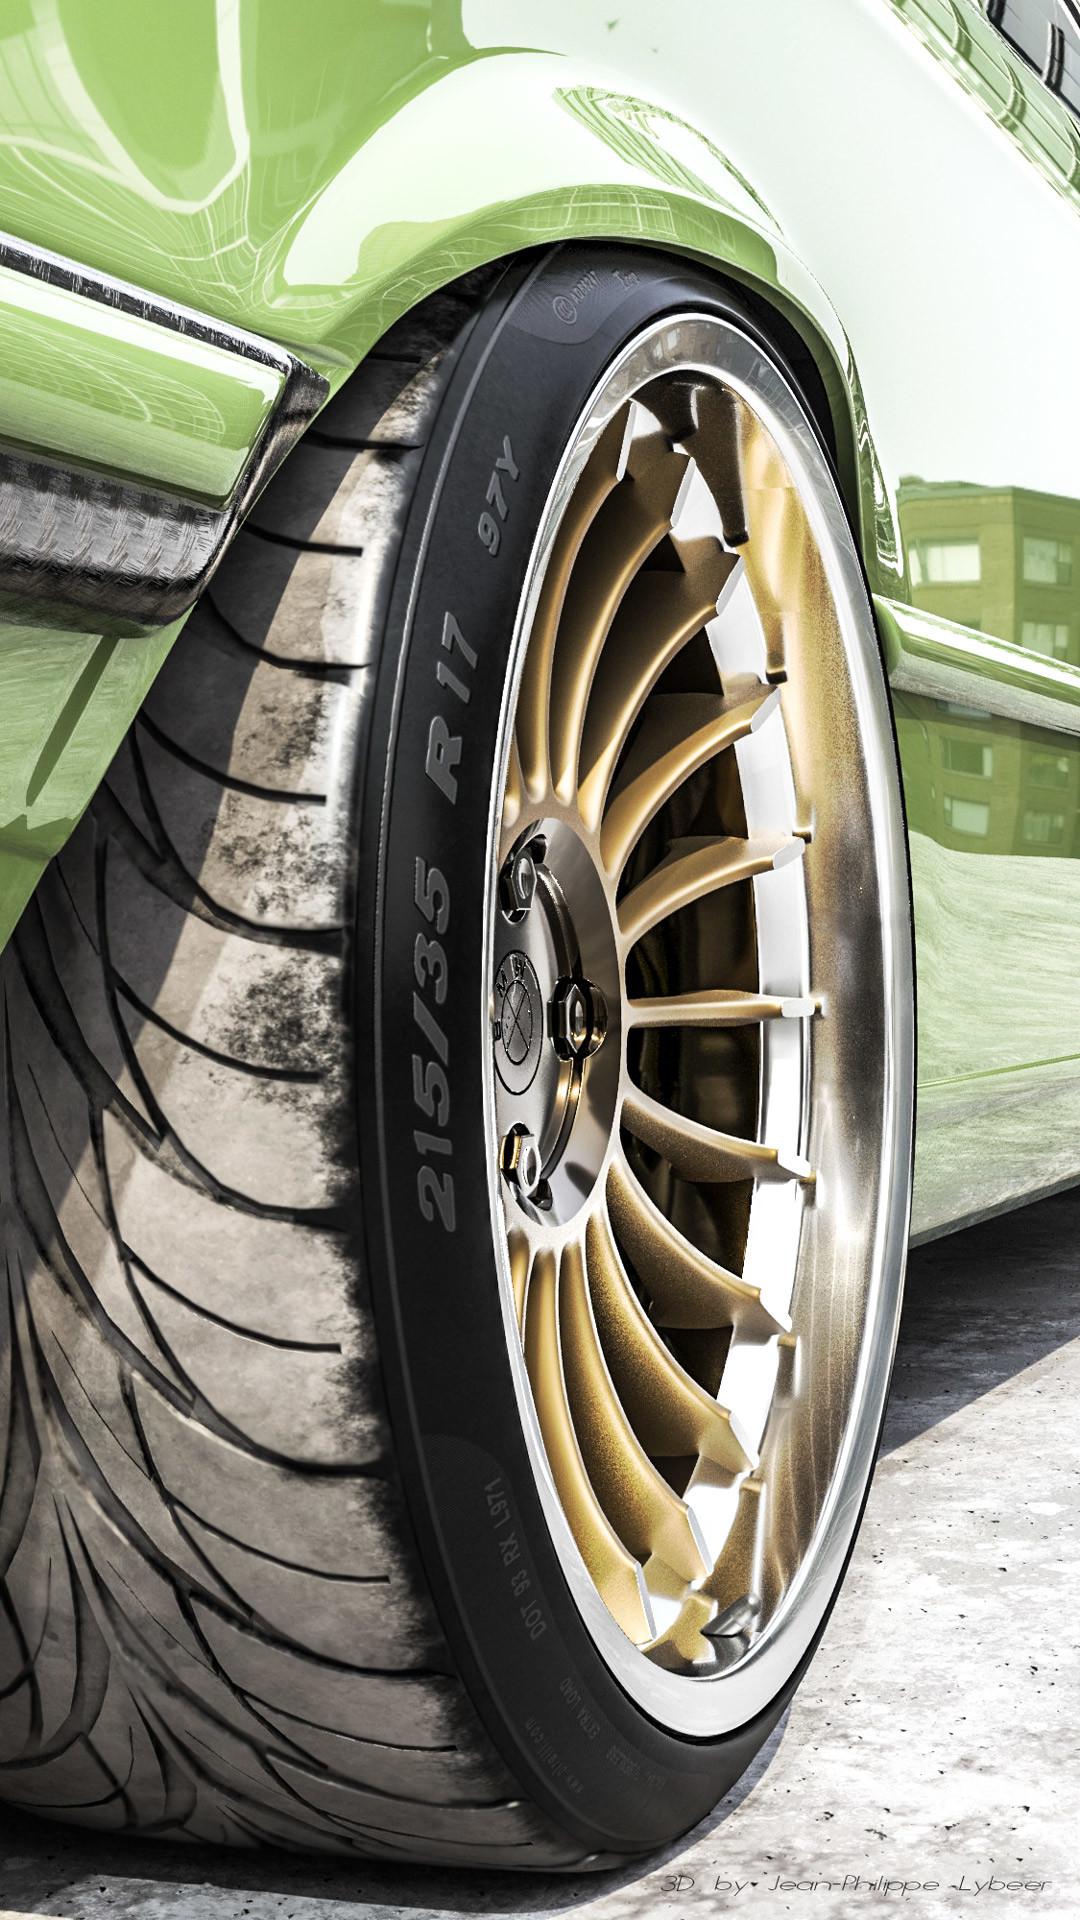 Jean philippe lybeer bmw e21 5 wheel s